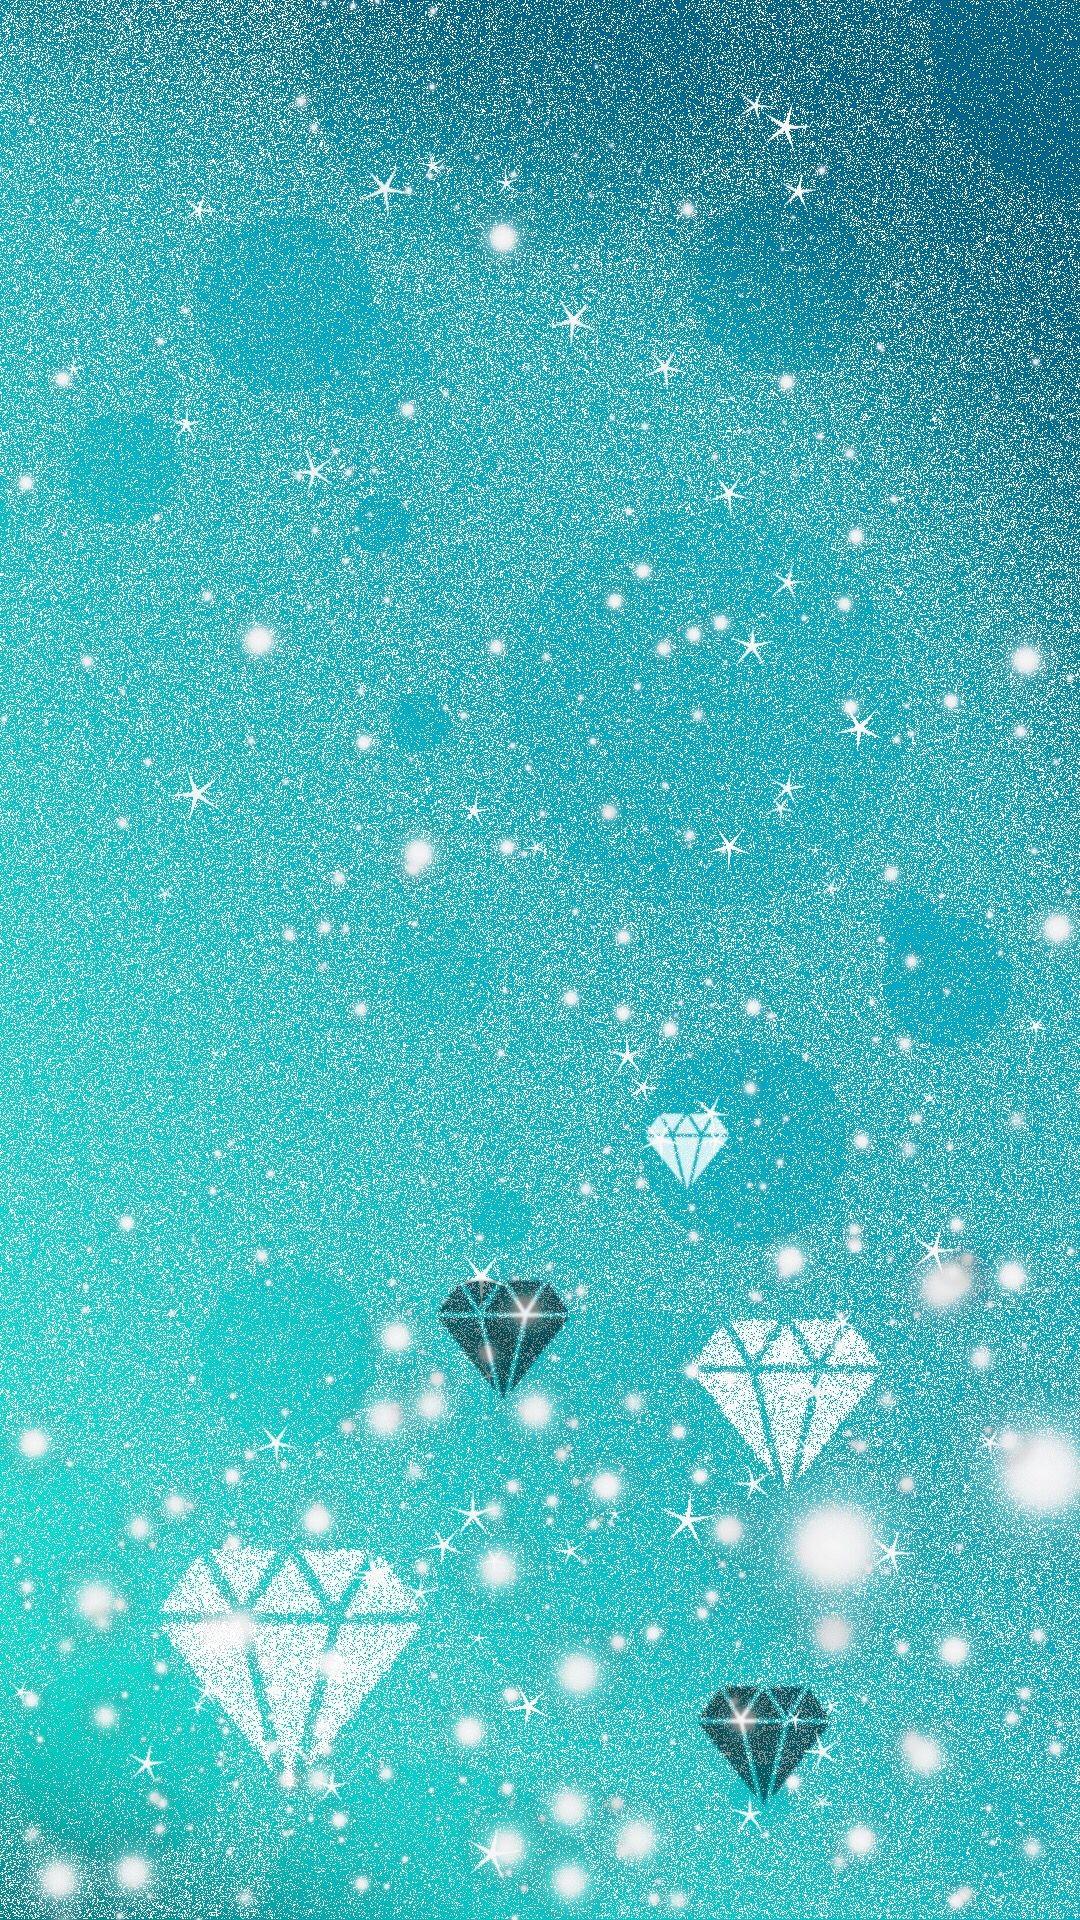 Res: 1080x1920, Diamonds girlie wallpaper